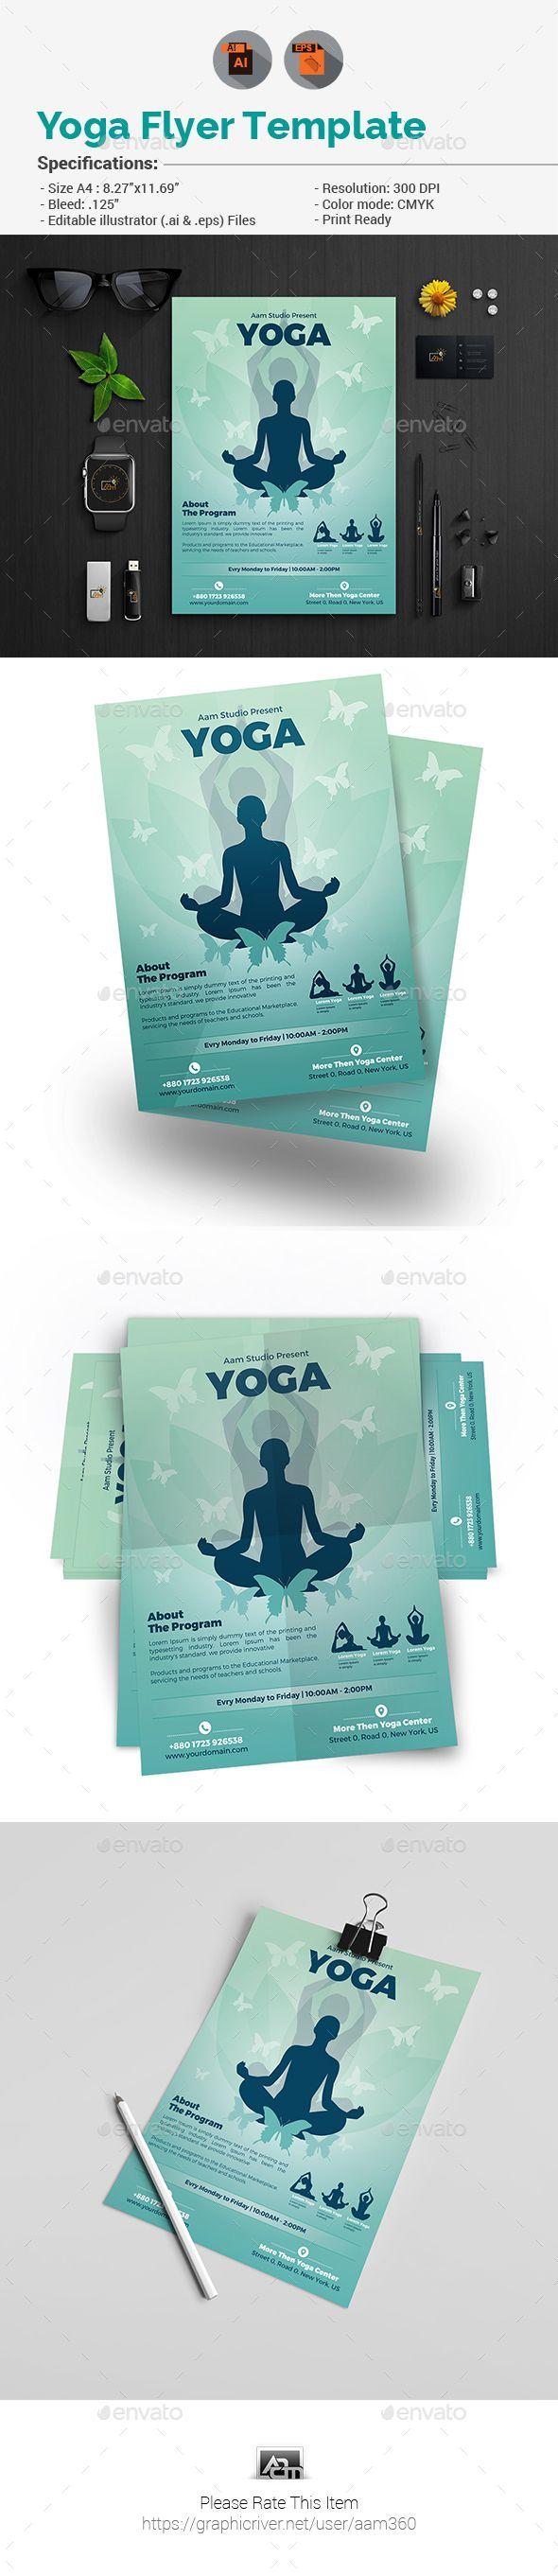 Yoga Flyer Template | Grafiken